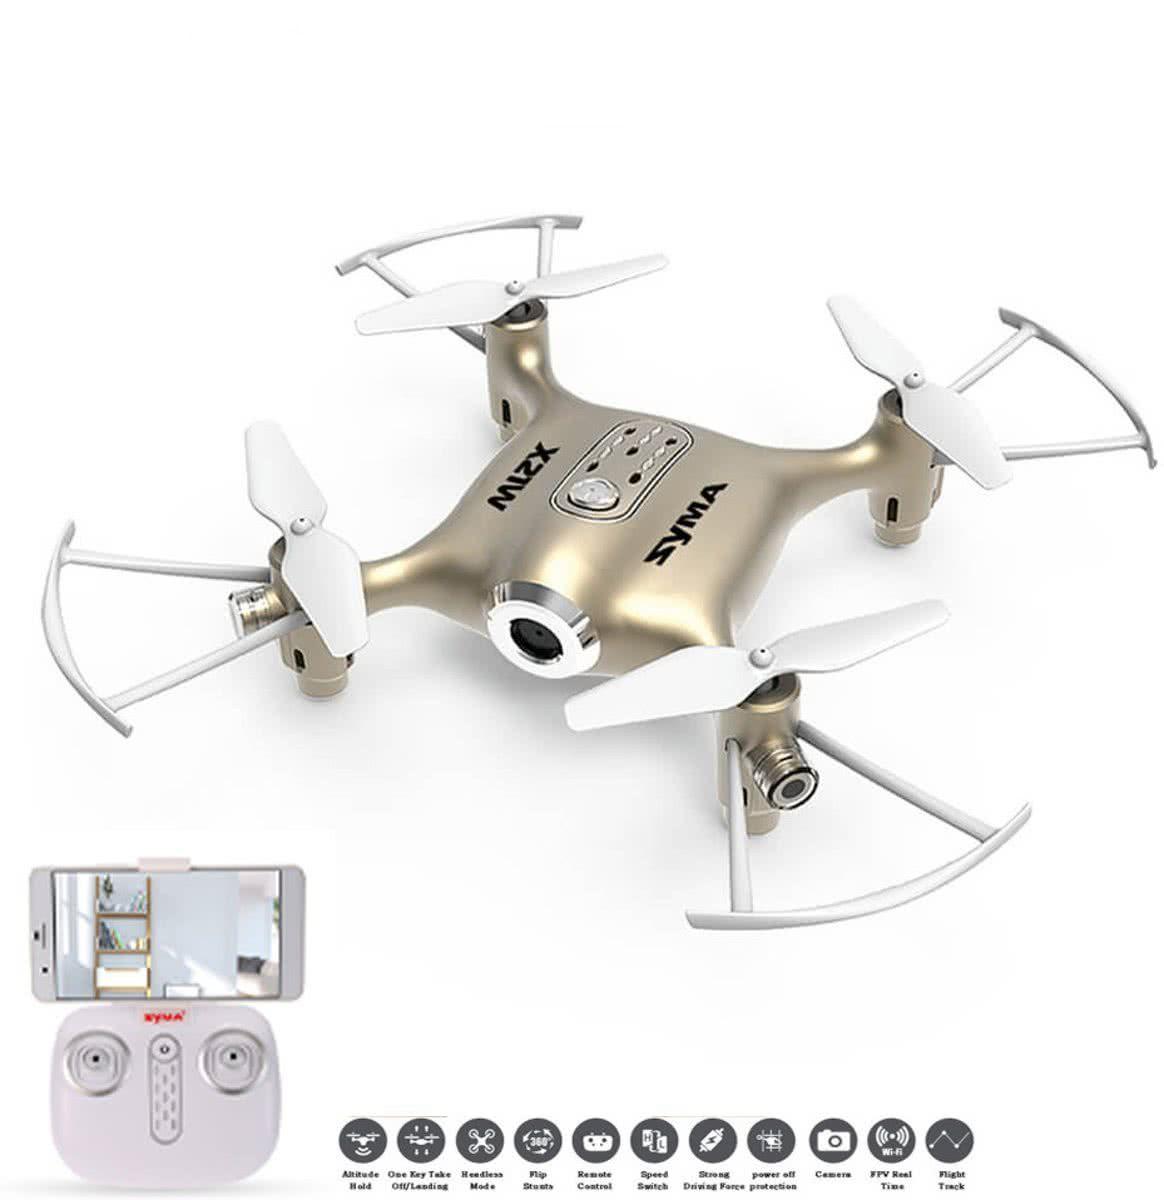 148d3df69e3 Toyhouse Syma X21W Wifi FPV Mini Drone With Camera Live Video LED Nano  Pocket RC Quadcopter With GYRO App Control, Golden - Buy Toyhouse Syma X21W  Wifi FPV ...